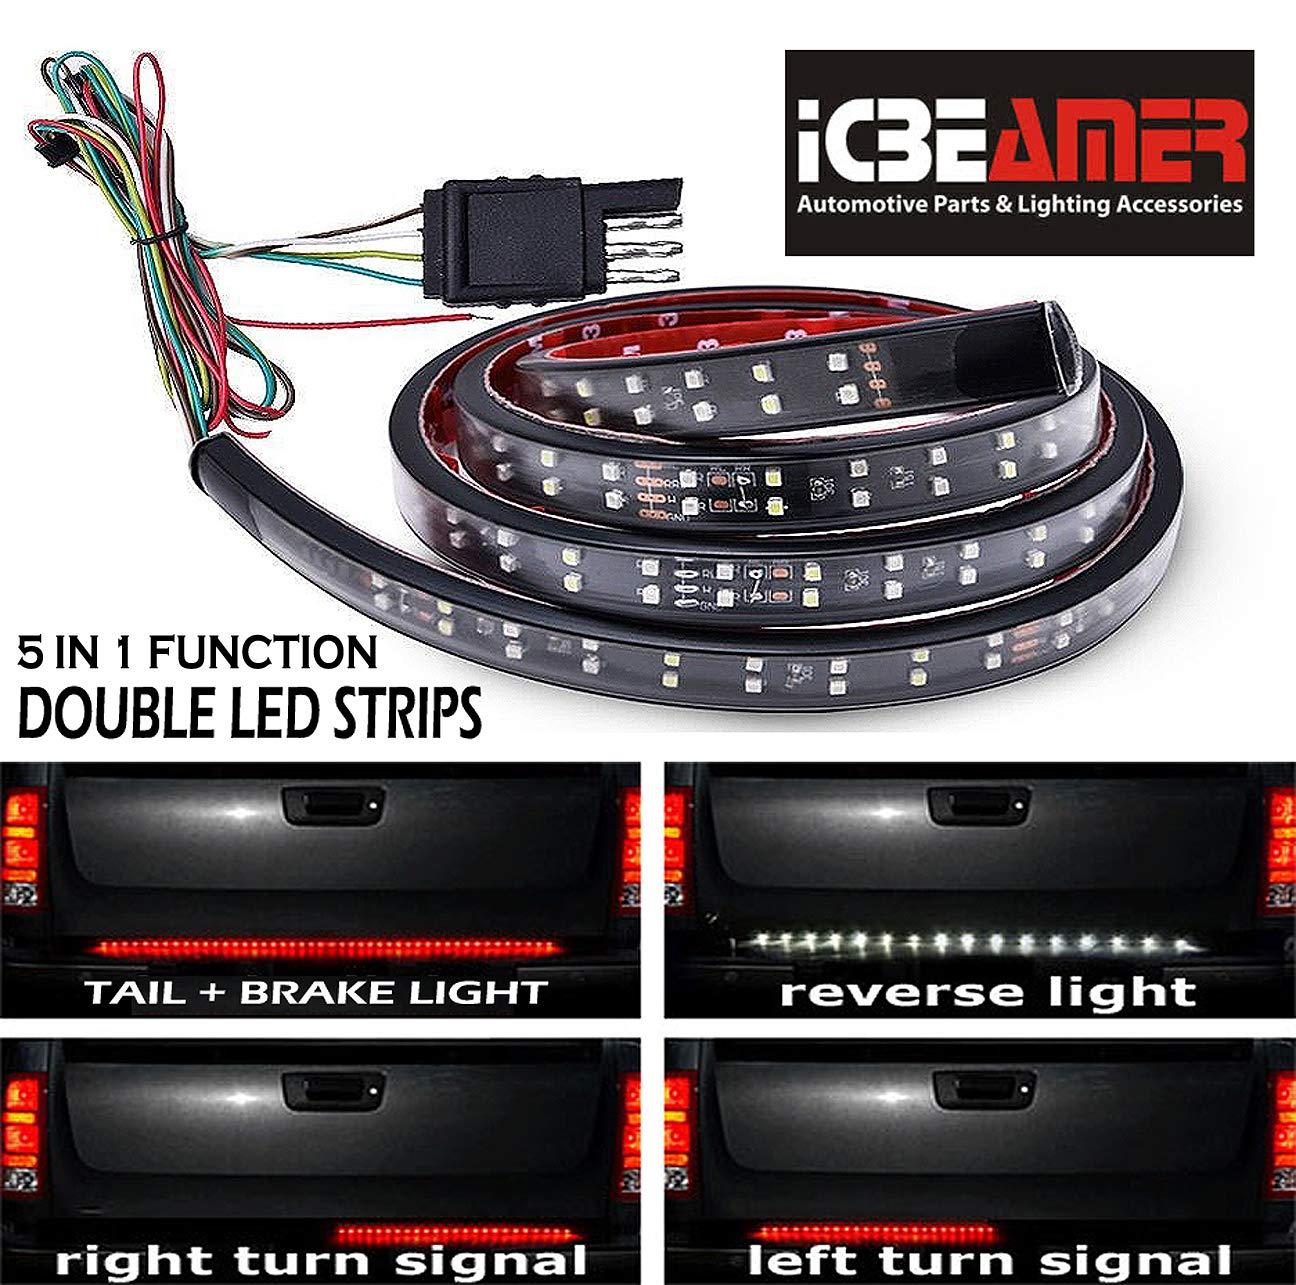 ICBEAMER 5-Function 60'' 2 Row LED Truck Tailgate Side Bed Light Strip Bar Waterproof Reverse Turn Signal, Parking, Brake by ICBEAMER